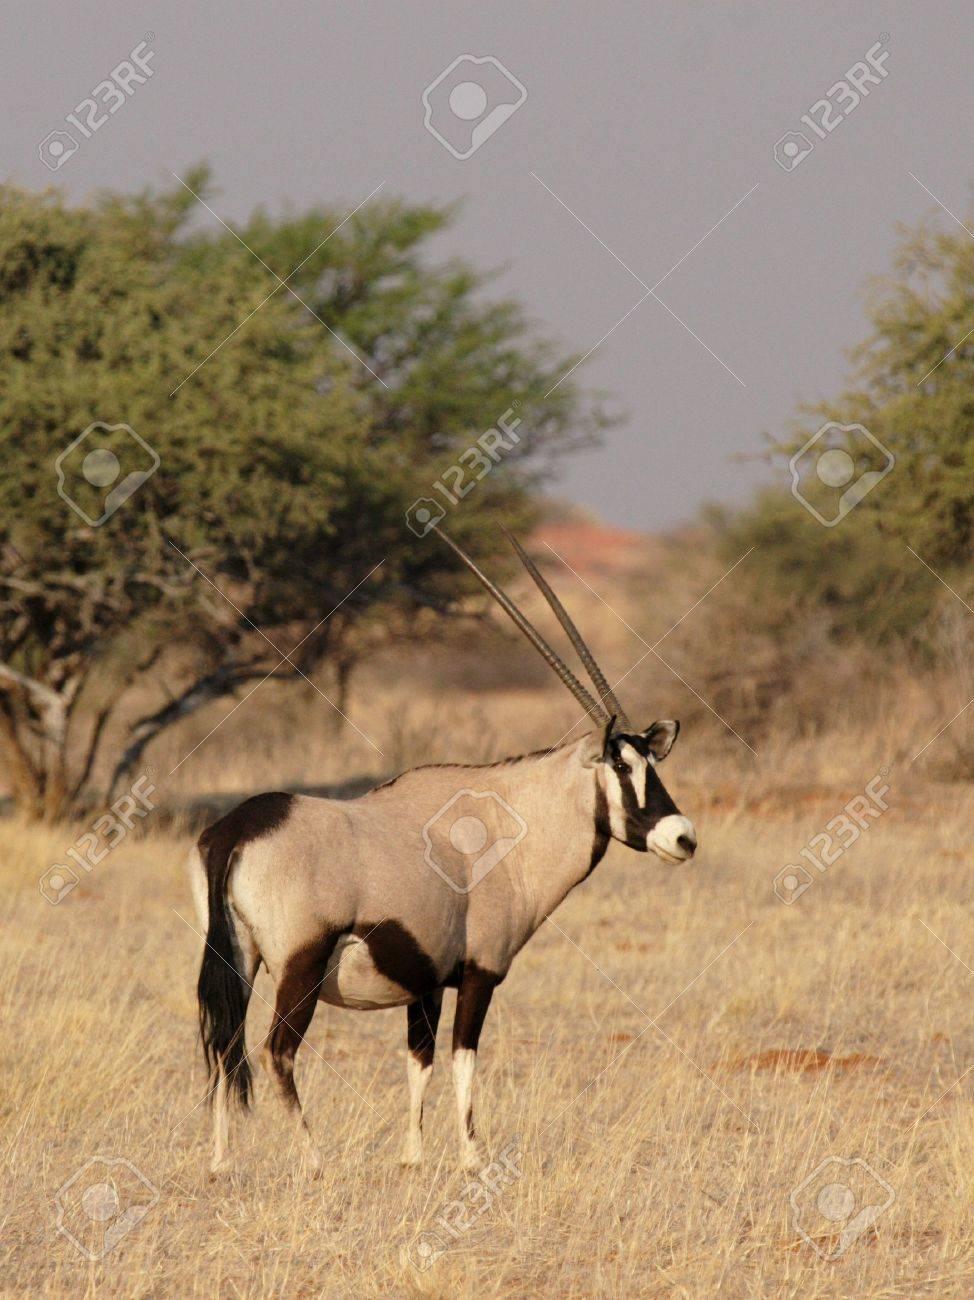 Gemsbok (Oryx gazella) in the Kalahari Desert, Namibia Stock Photo - 4783418